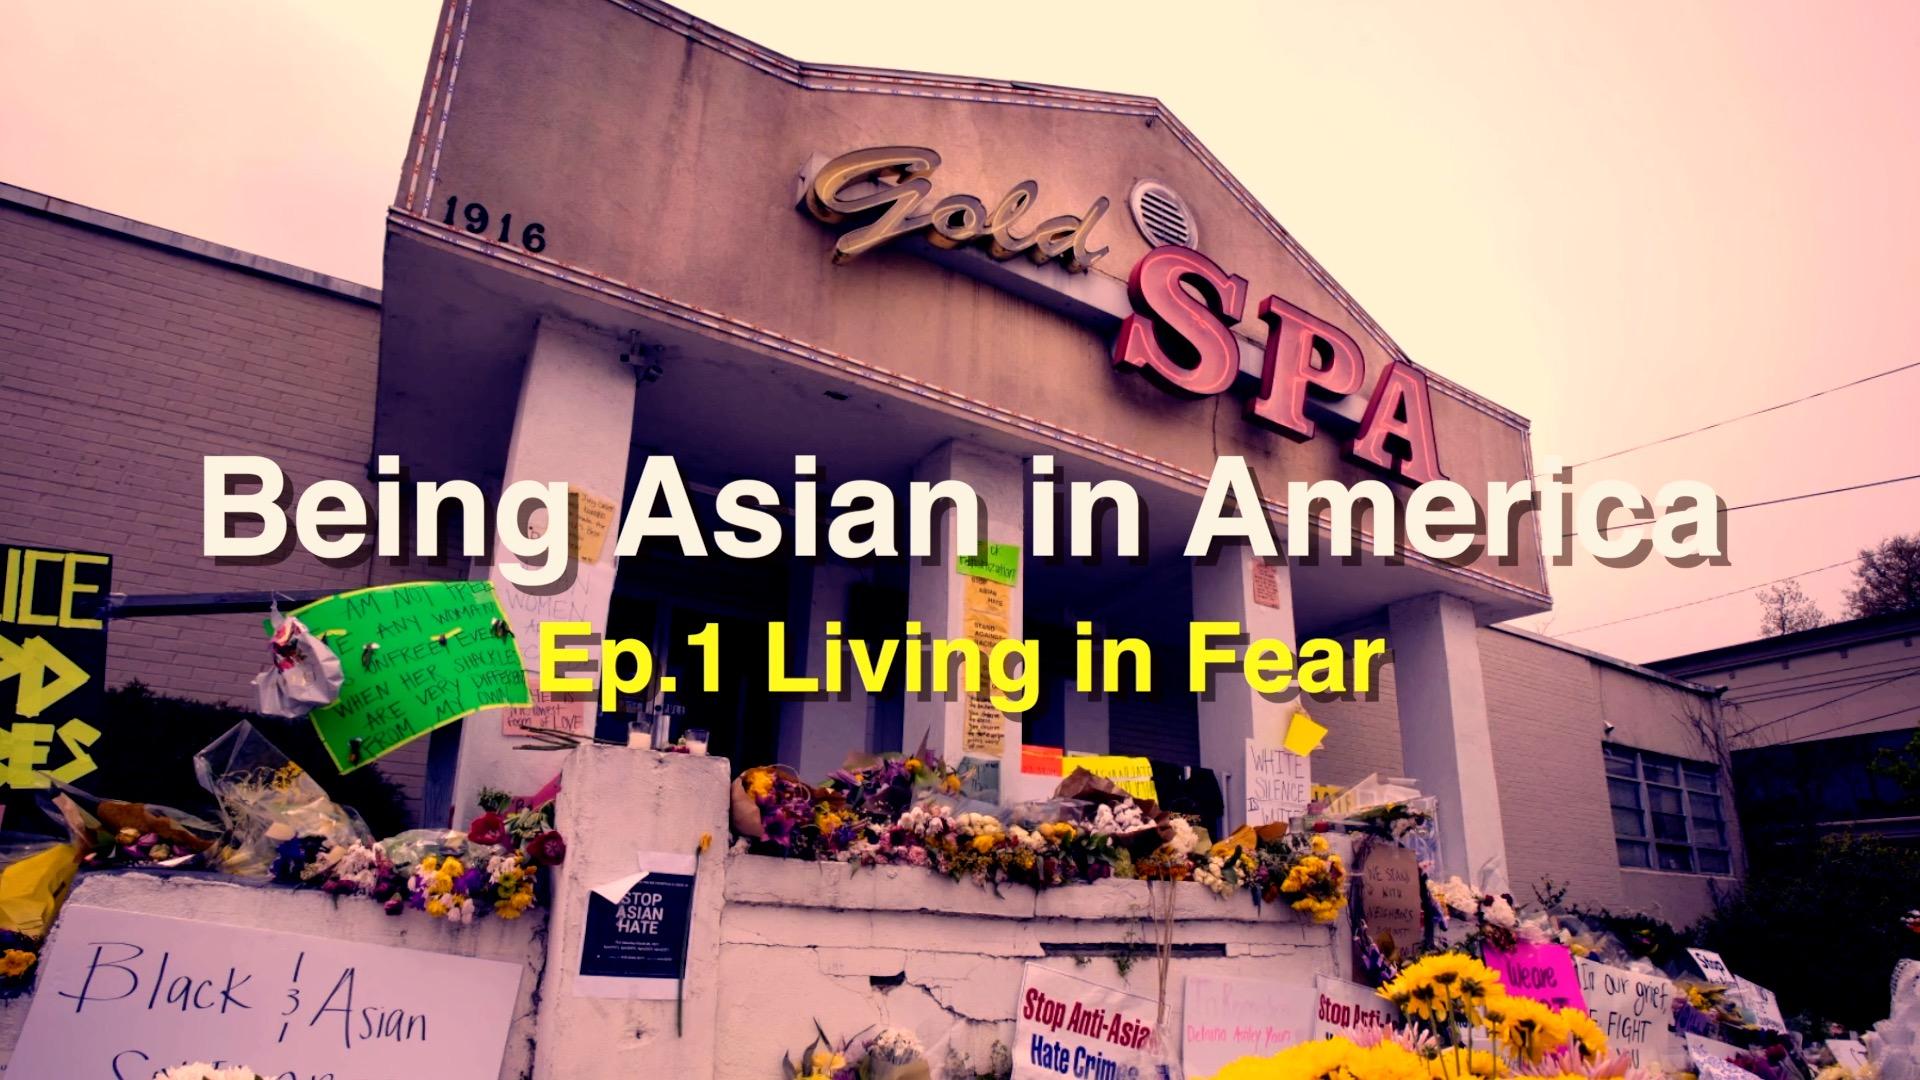 GLOBALink | Being Asian in America Ep.1: Living in fear